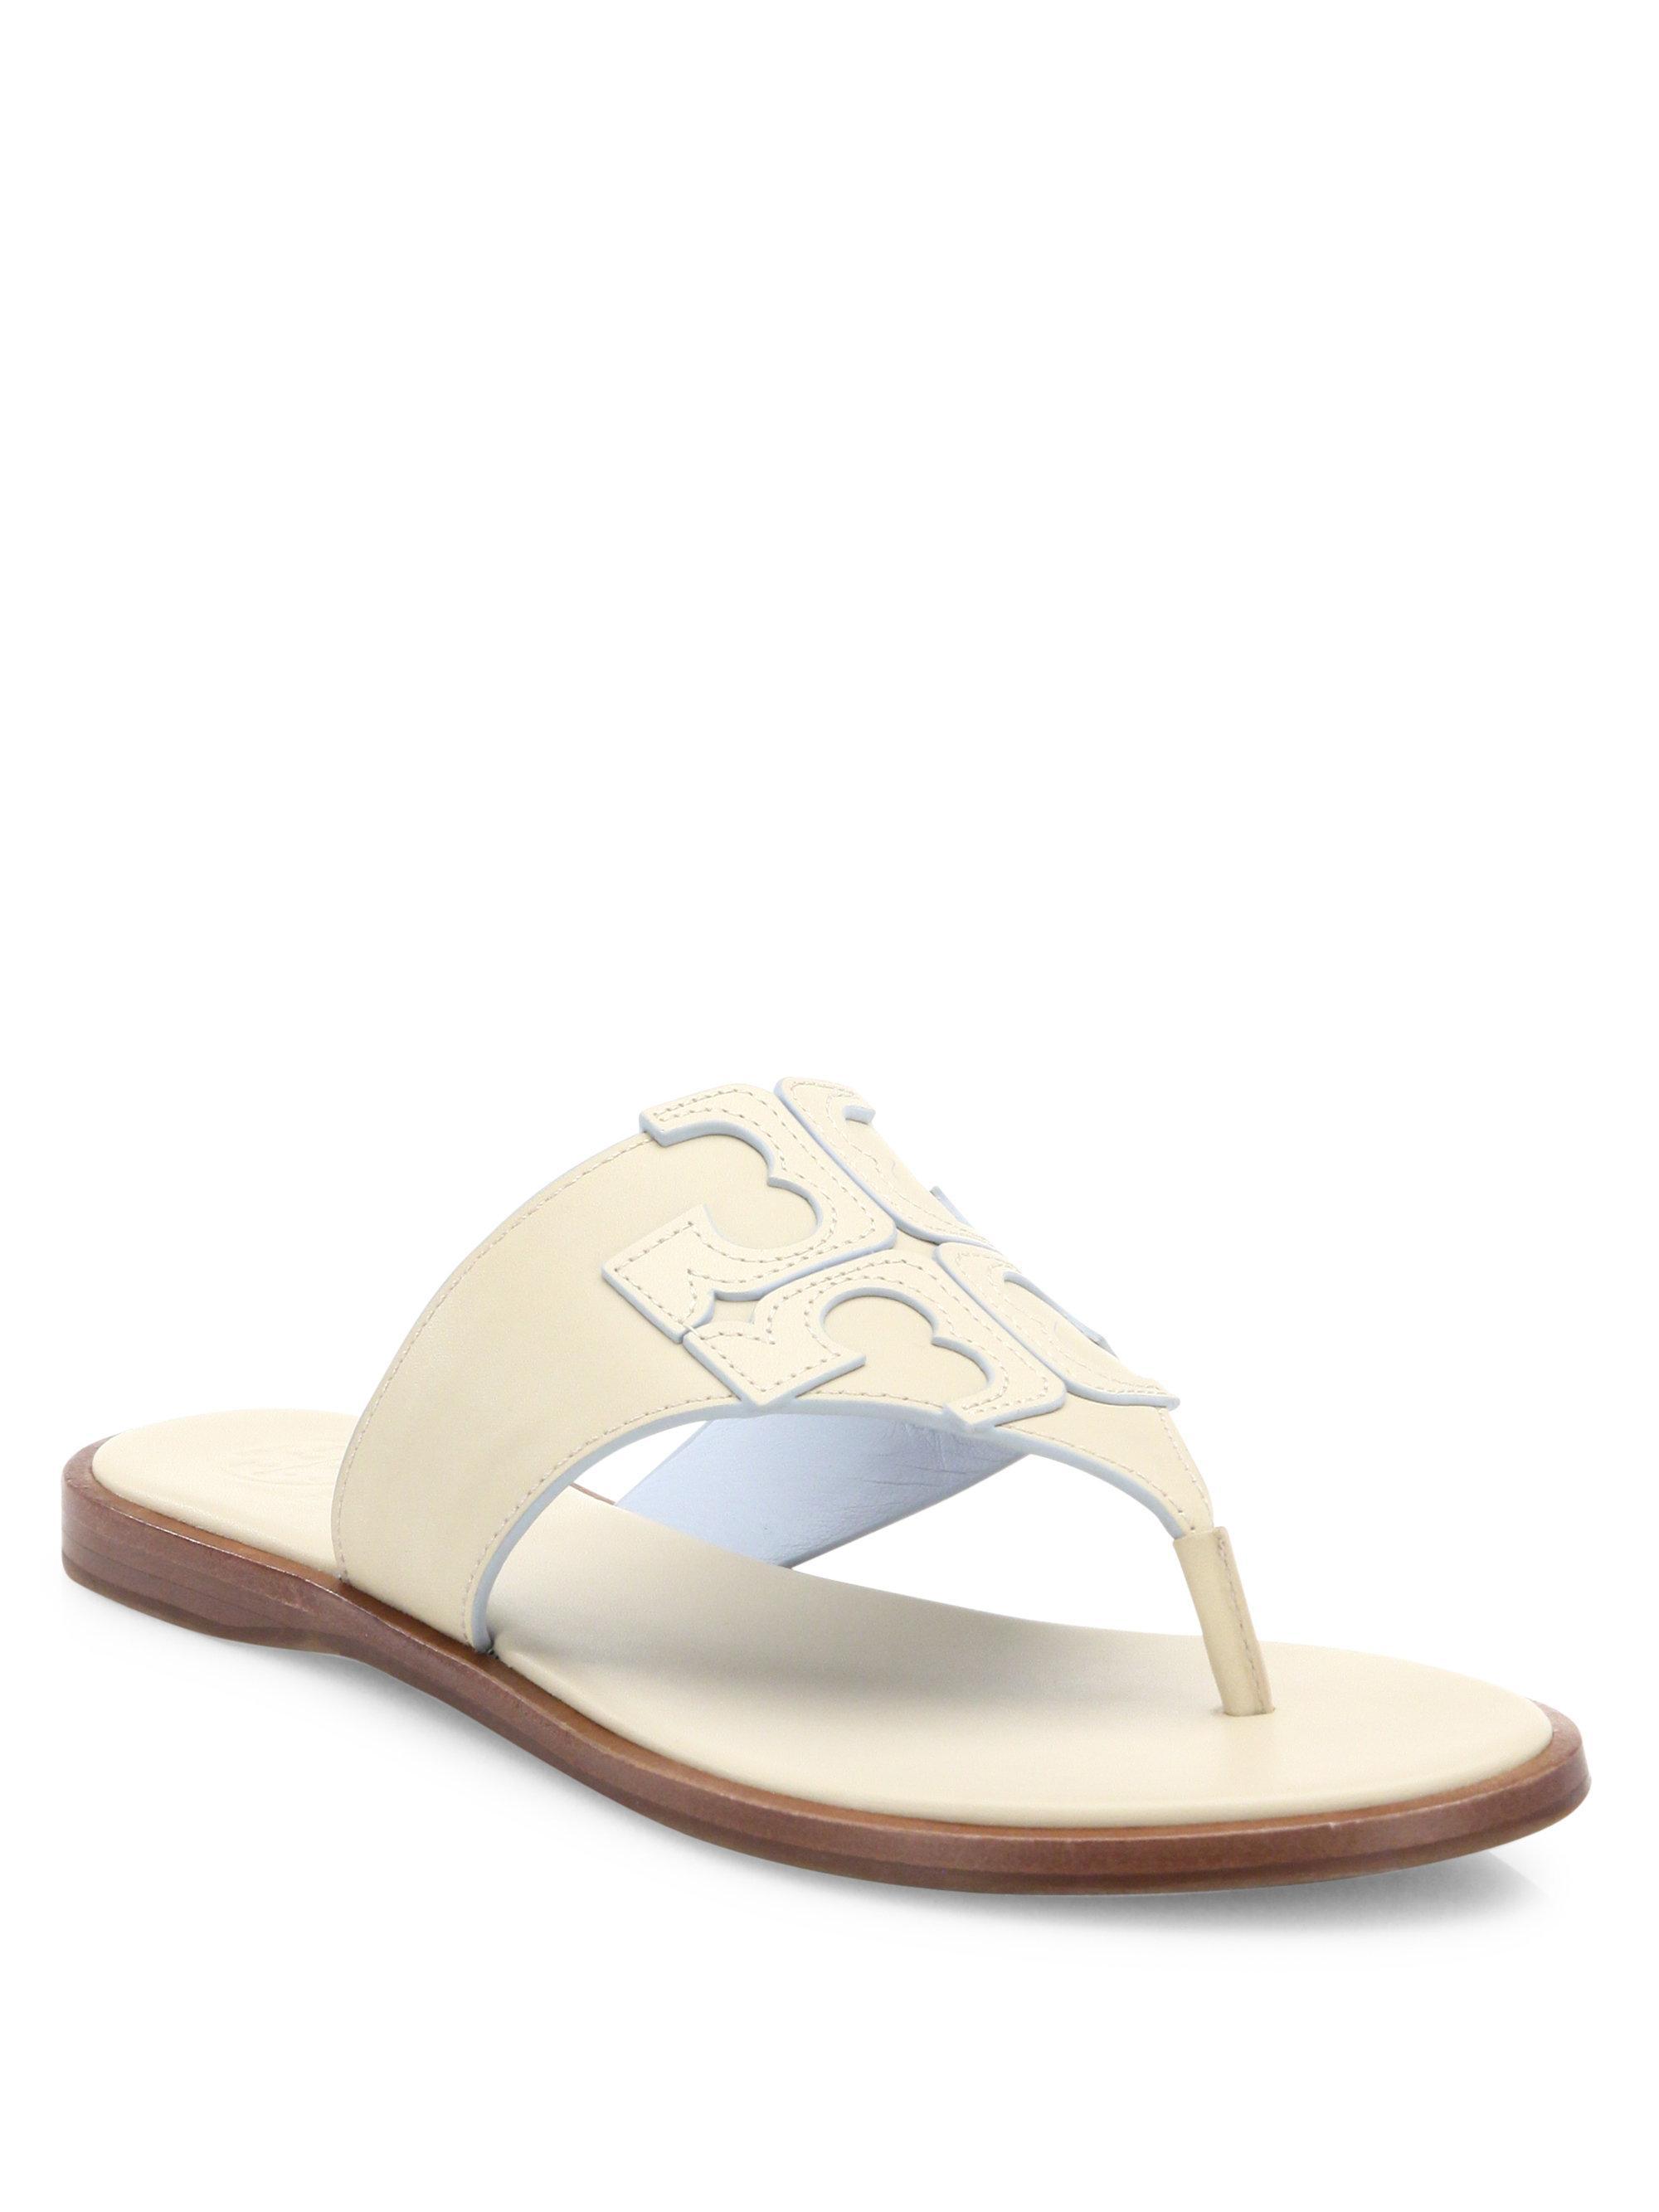 53a337220d2033 Lyst - Tory Burch Jamie Logo Thong Sandals